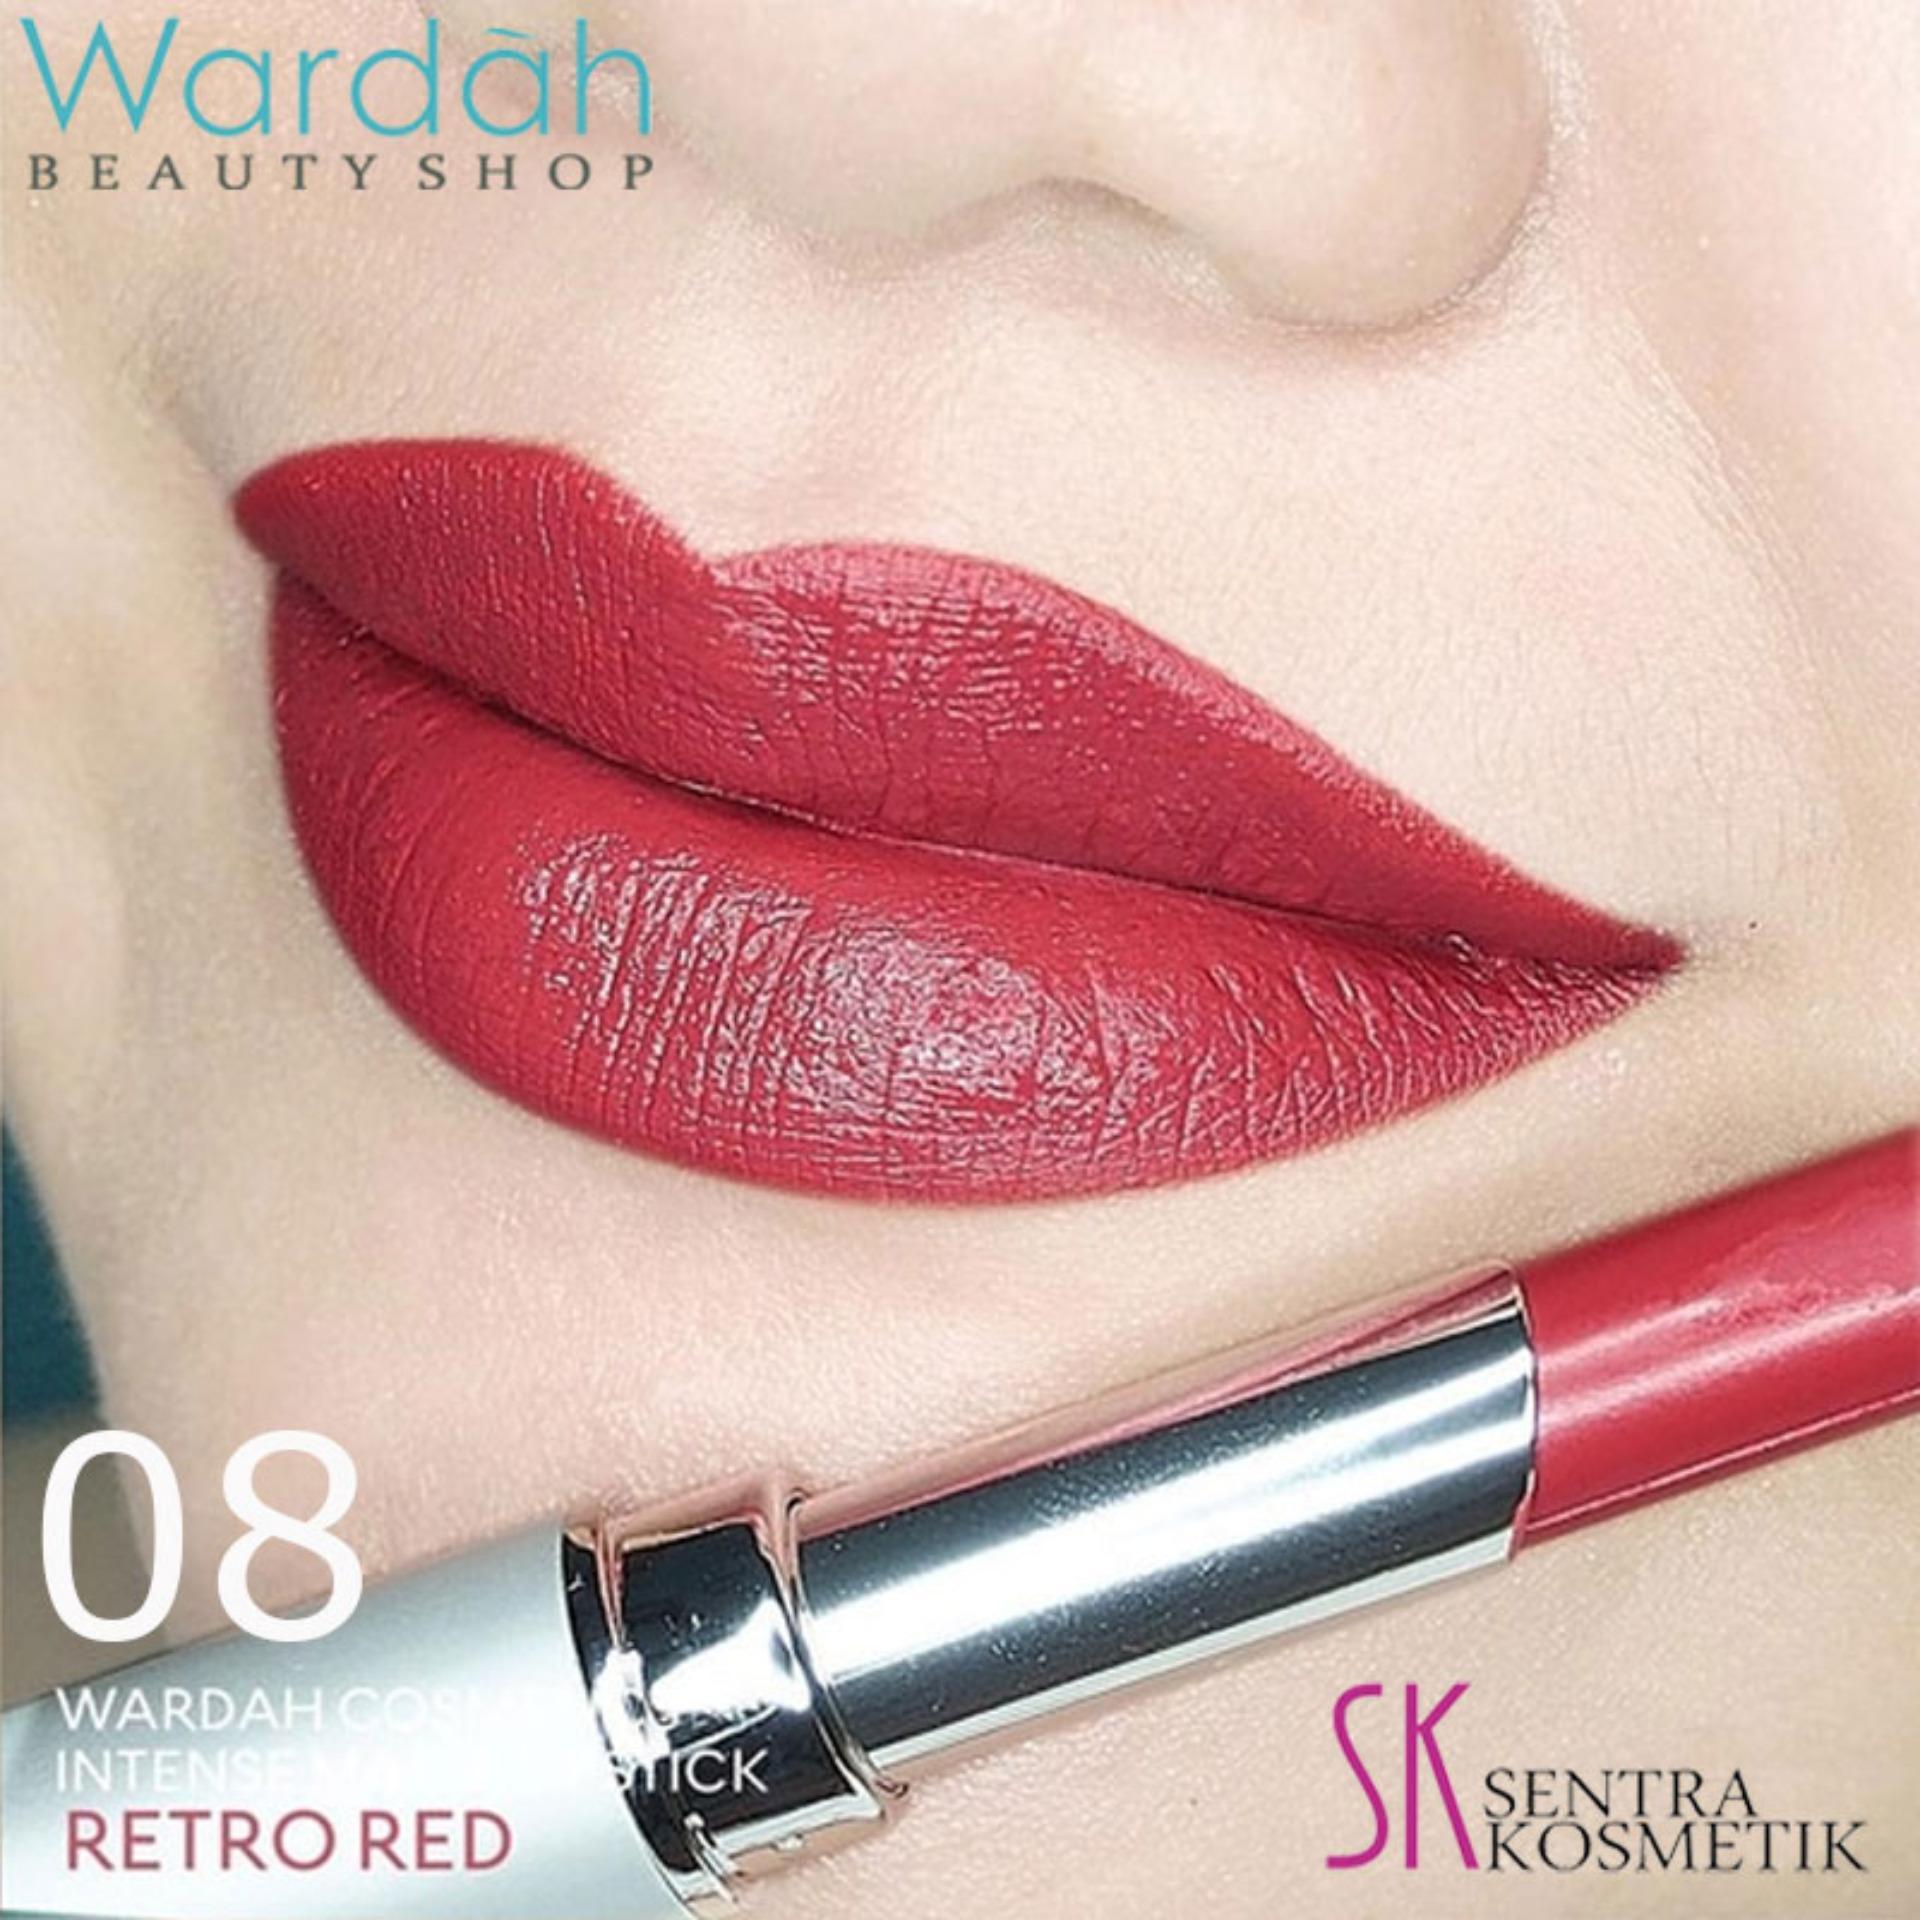 Wardah INTENSE Matte Lipstick 08 Retro Red